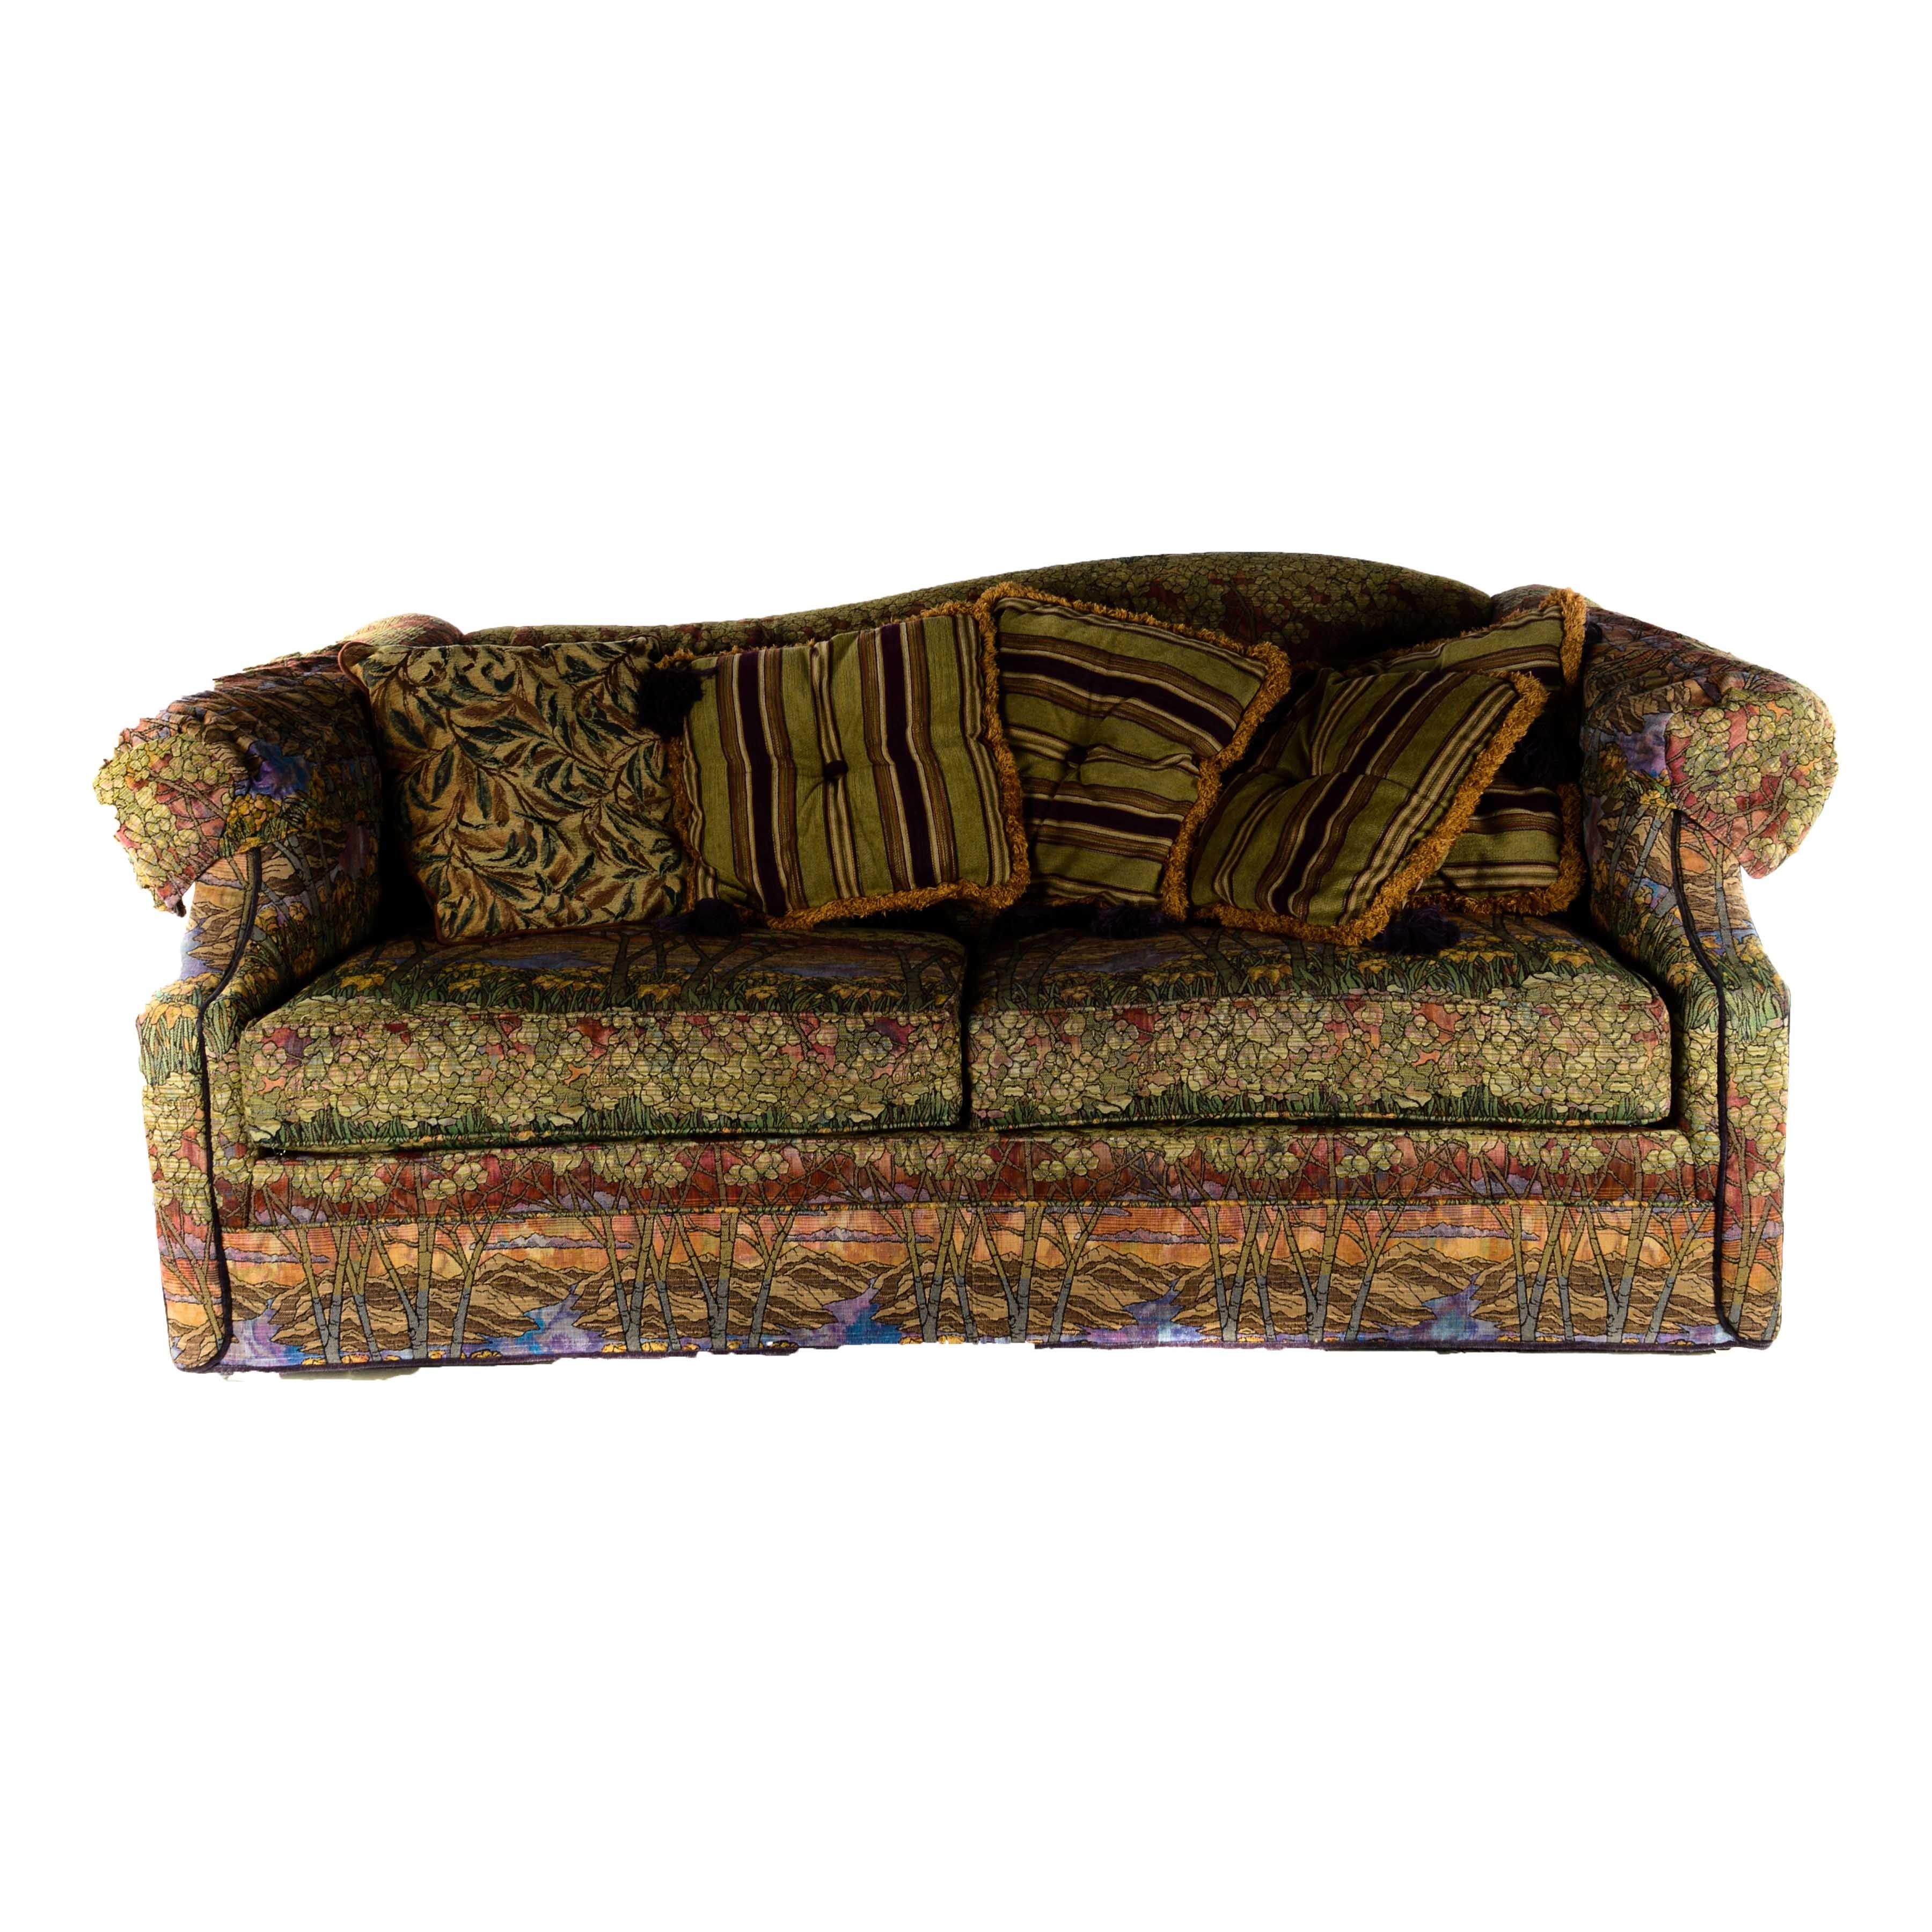 Contemporary Tiffany Glass Inspired Sofa By Woodmark ...